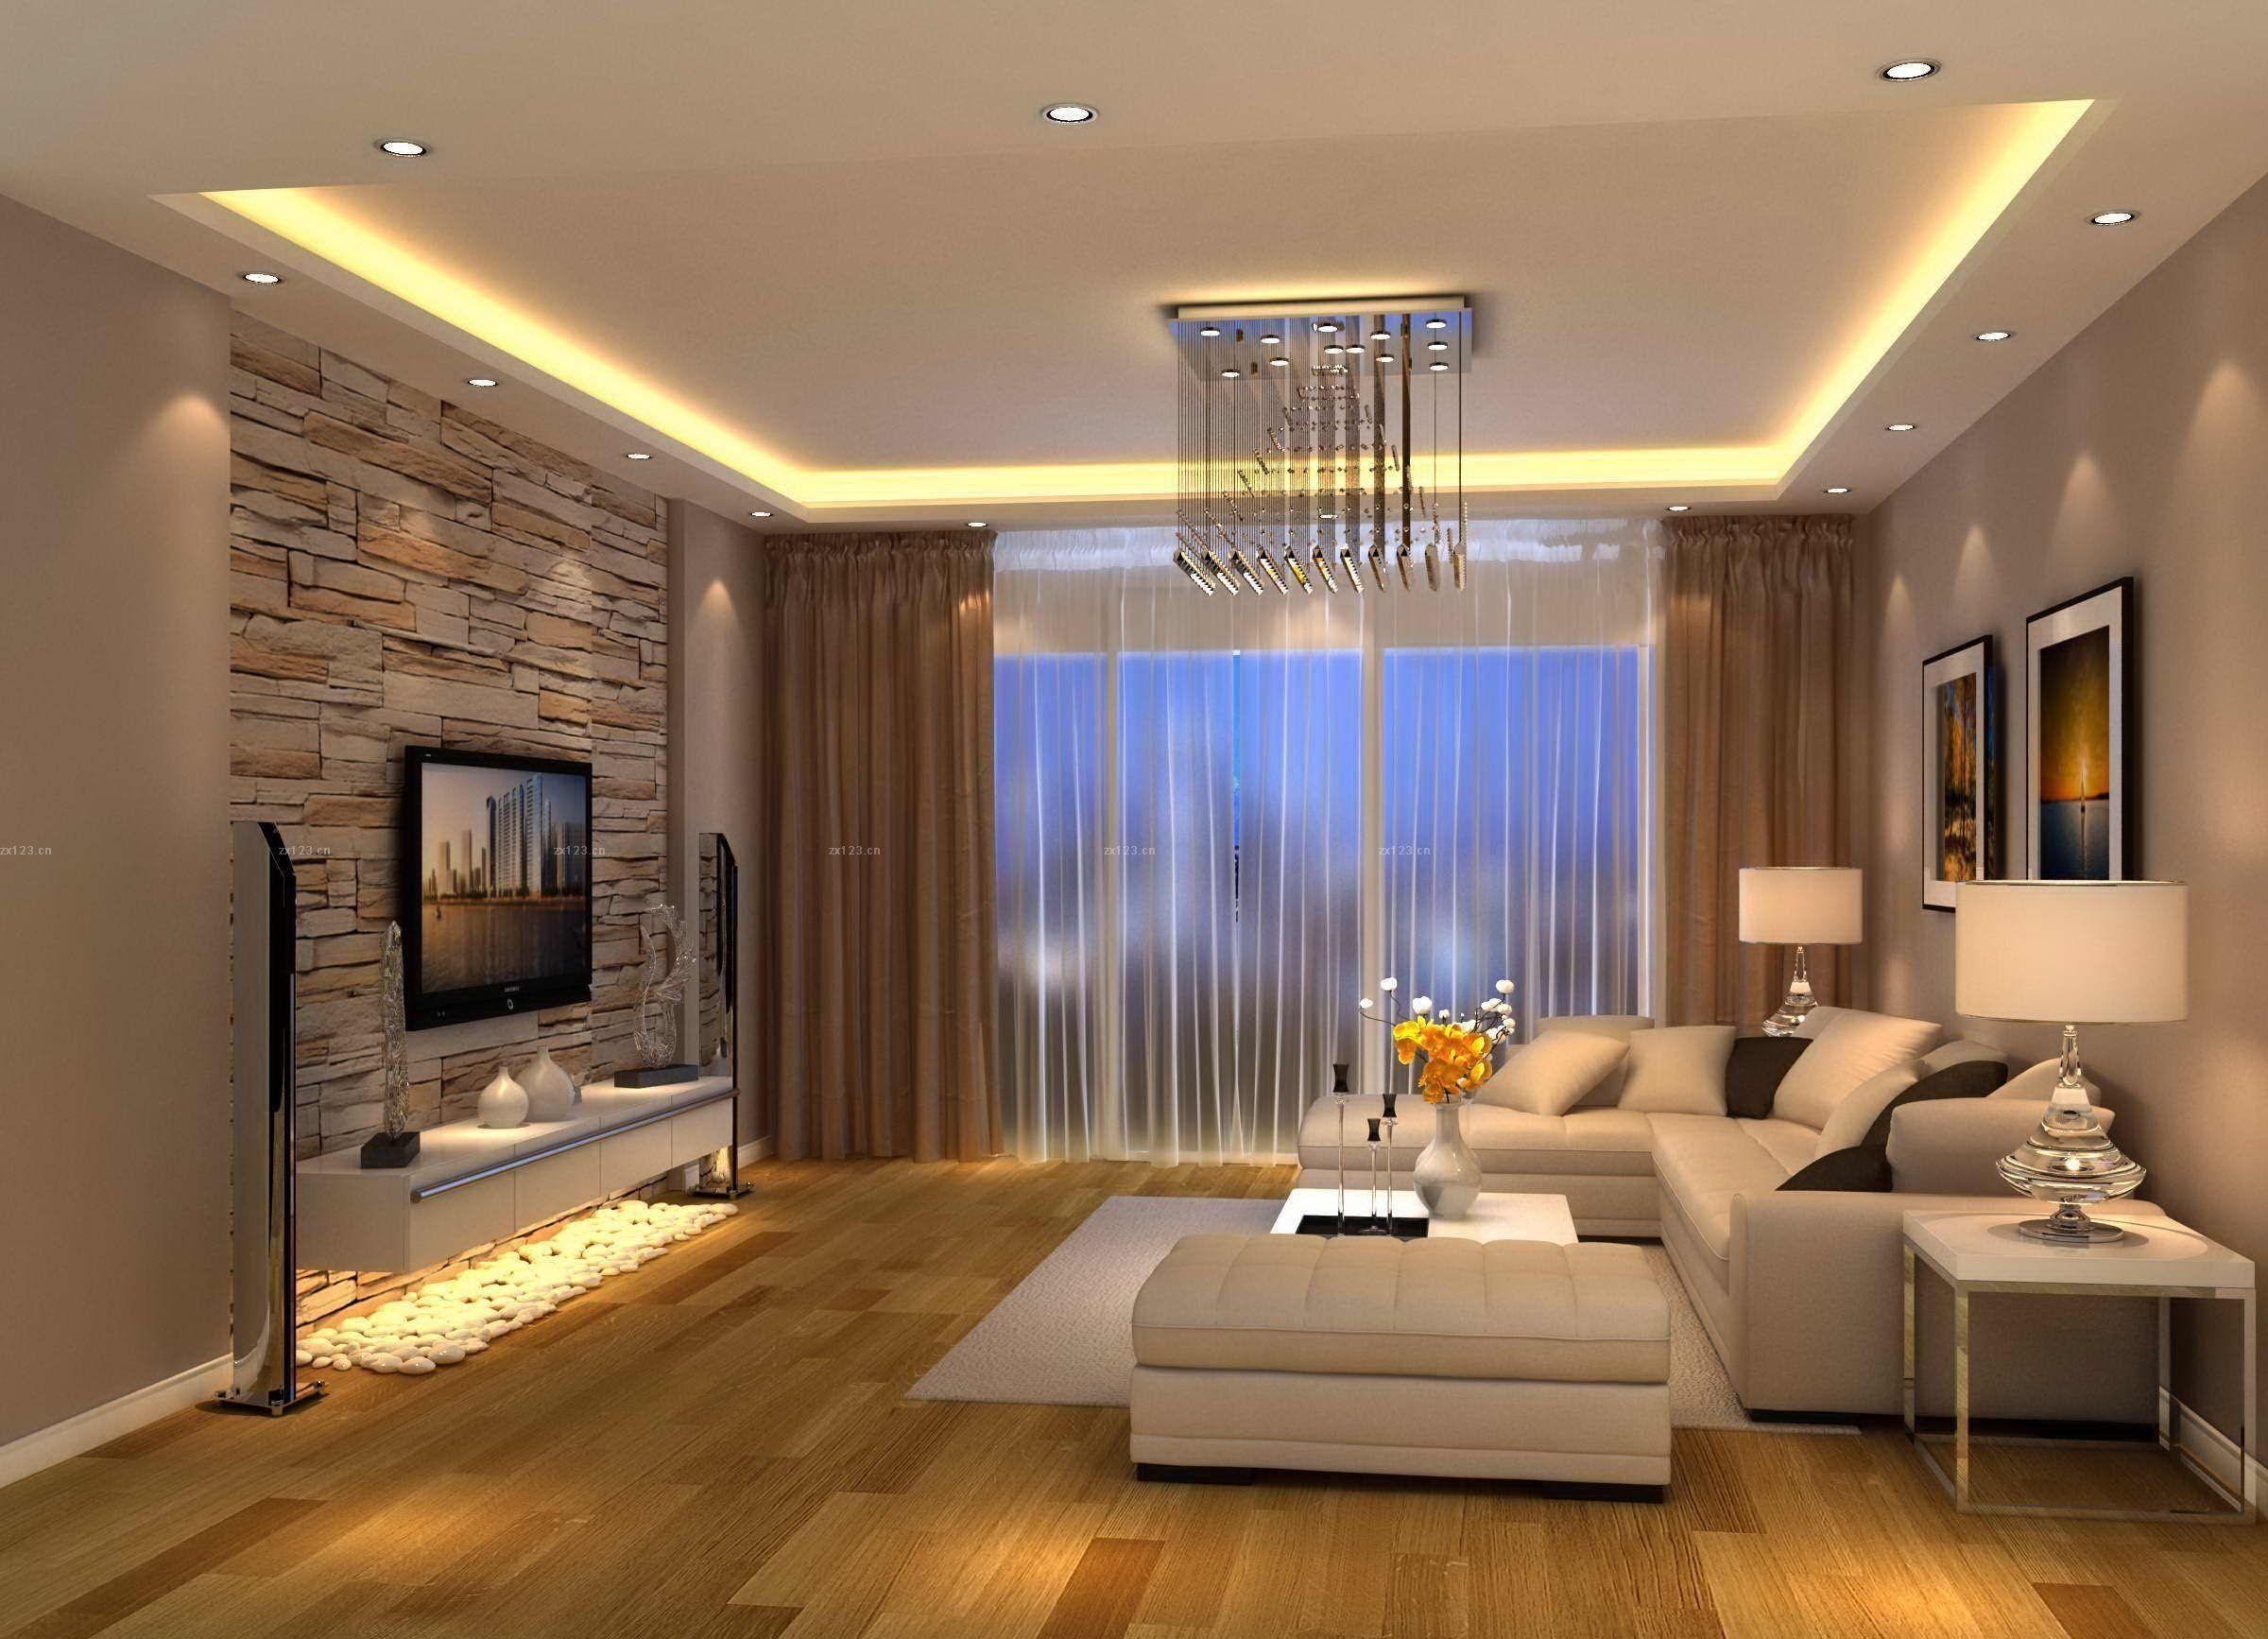 35 Luxury Modern Brown Living Room Decorating Ideas In 2020 Modern Living Room Brown Ceiling Design Living Room Living Room Decor Modern